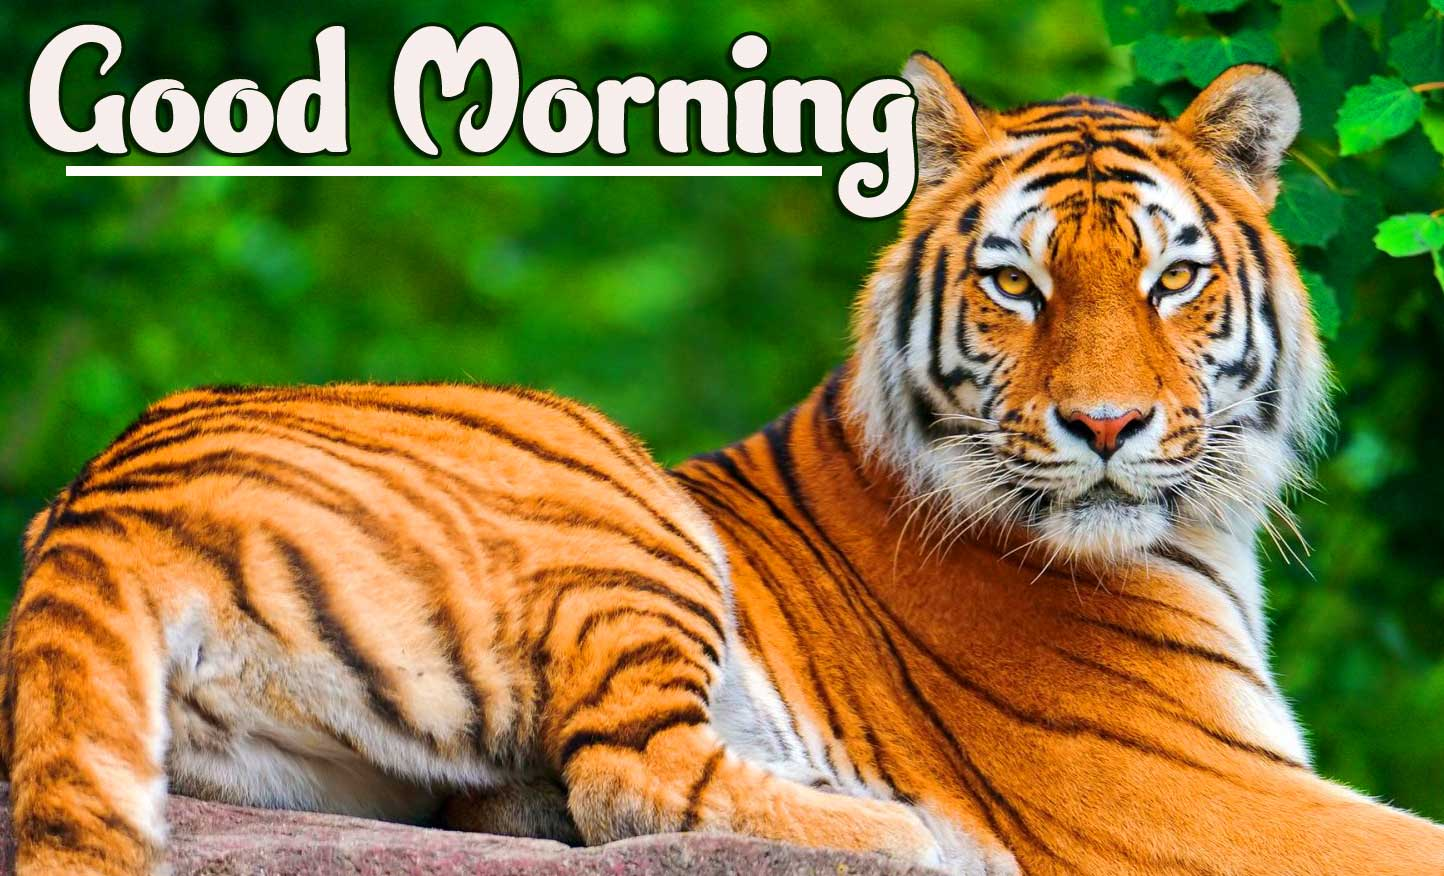 Animal Bird Lion Good Morning Wishes Wallpaper Latest Download Free